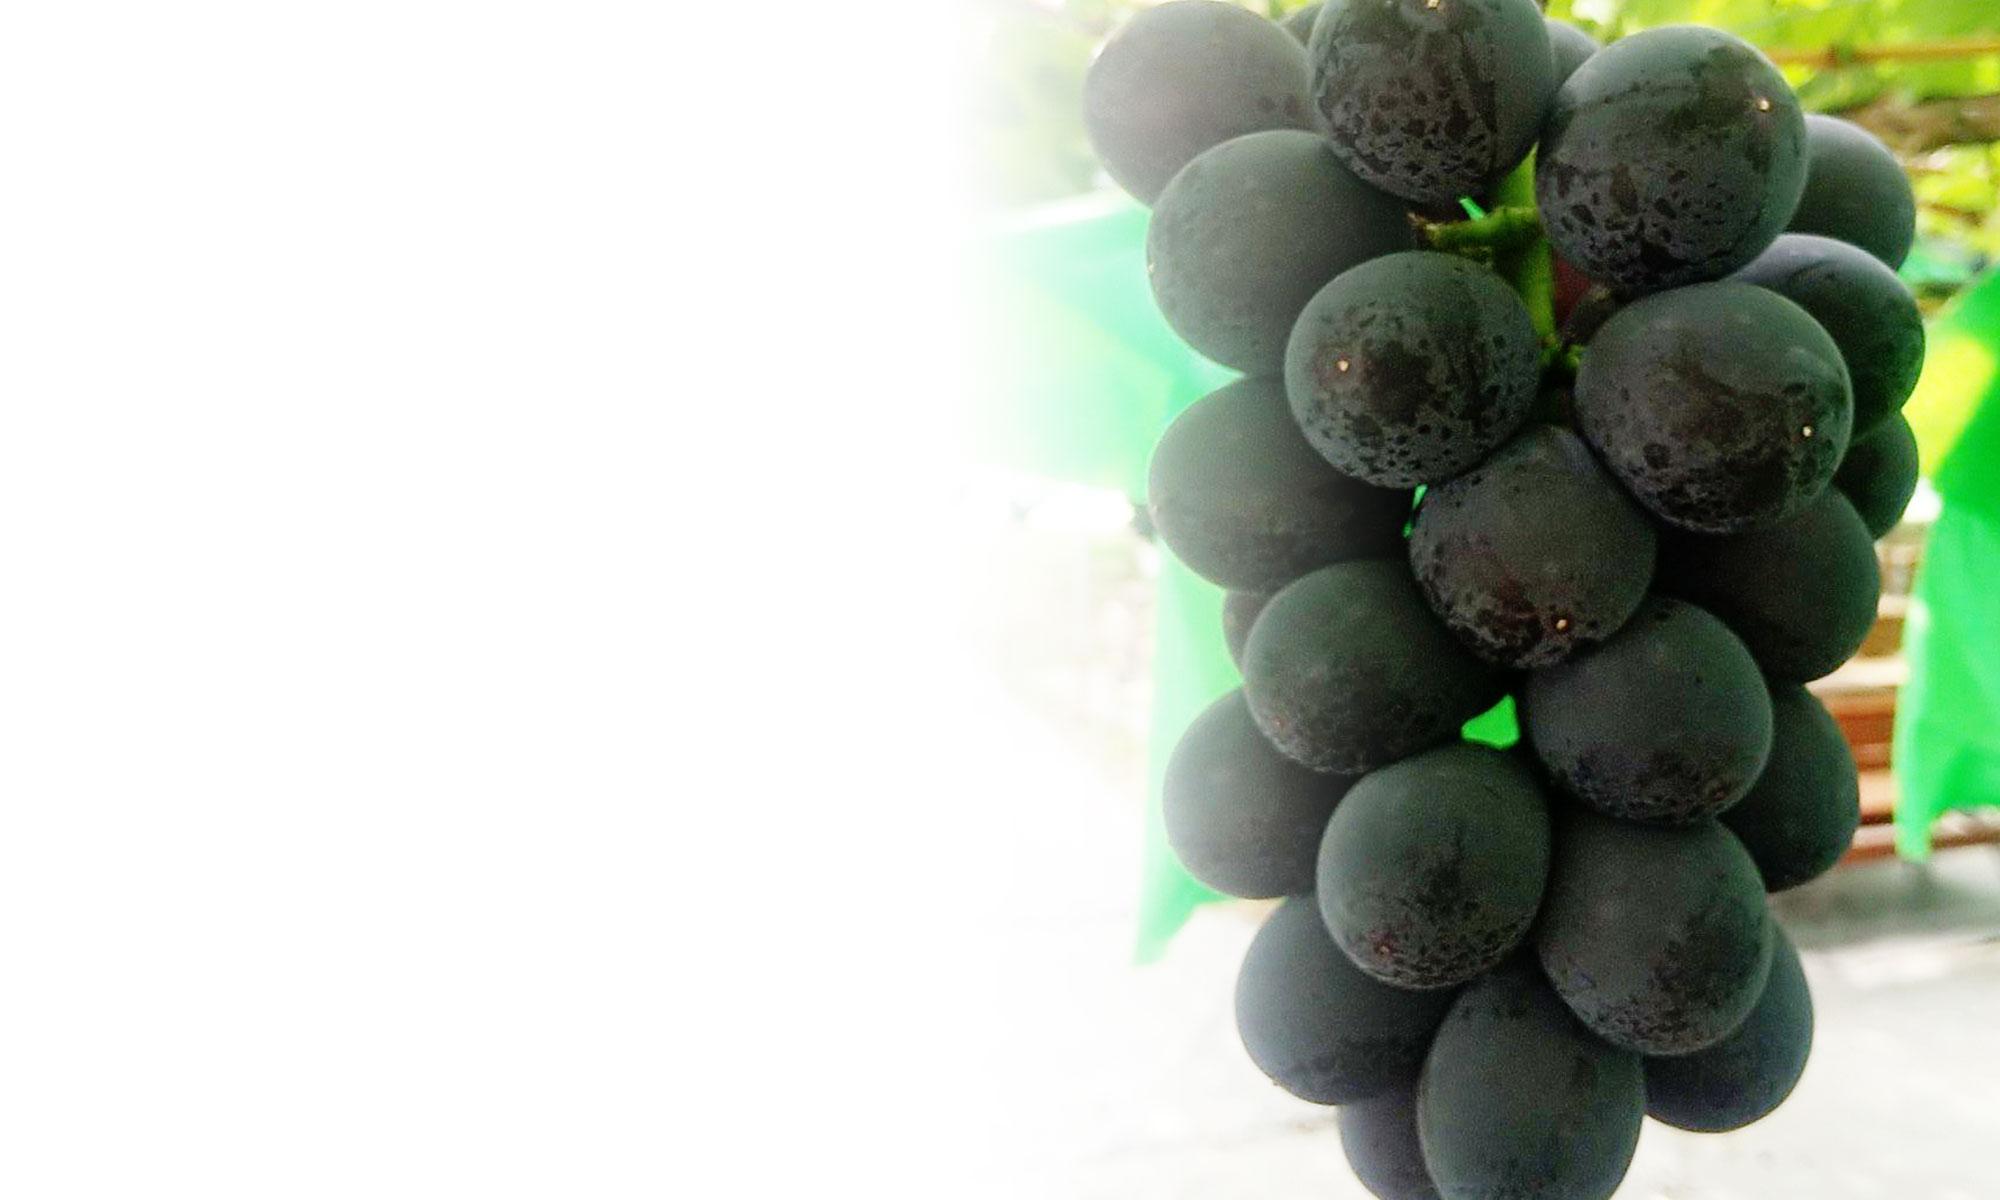 Ken'z Grape Garden (ケンズ グレープガーデン)